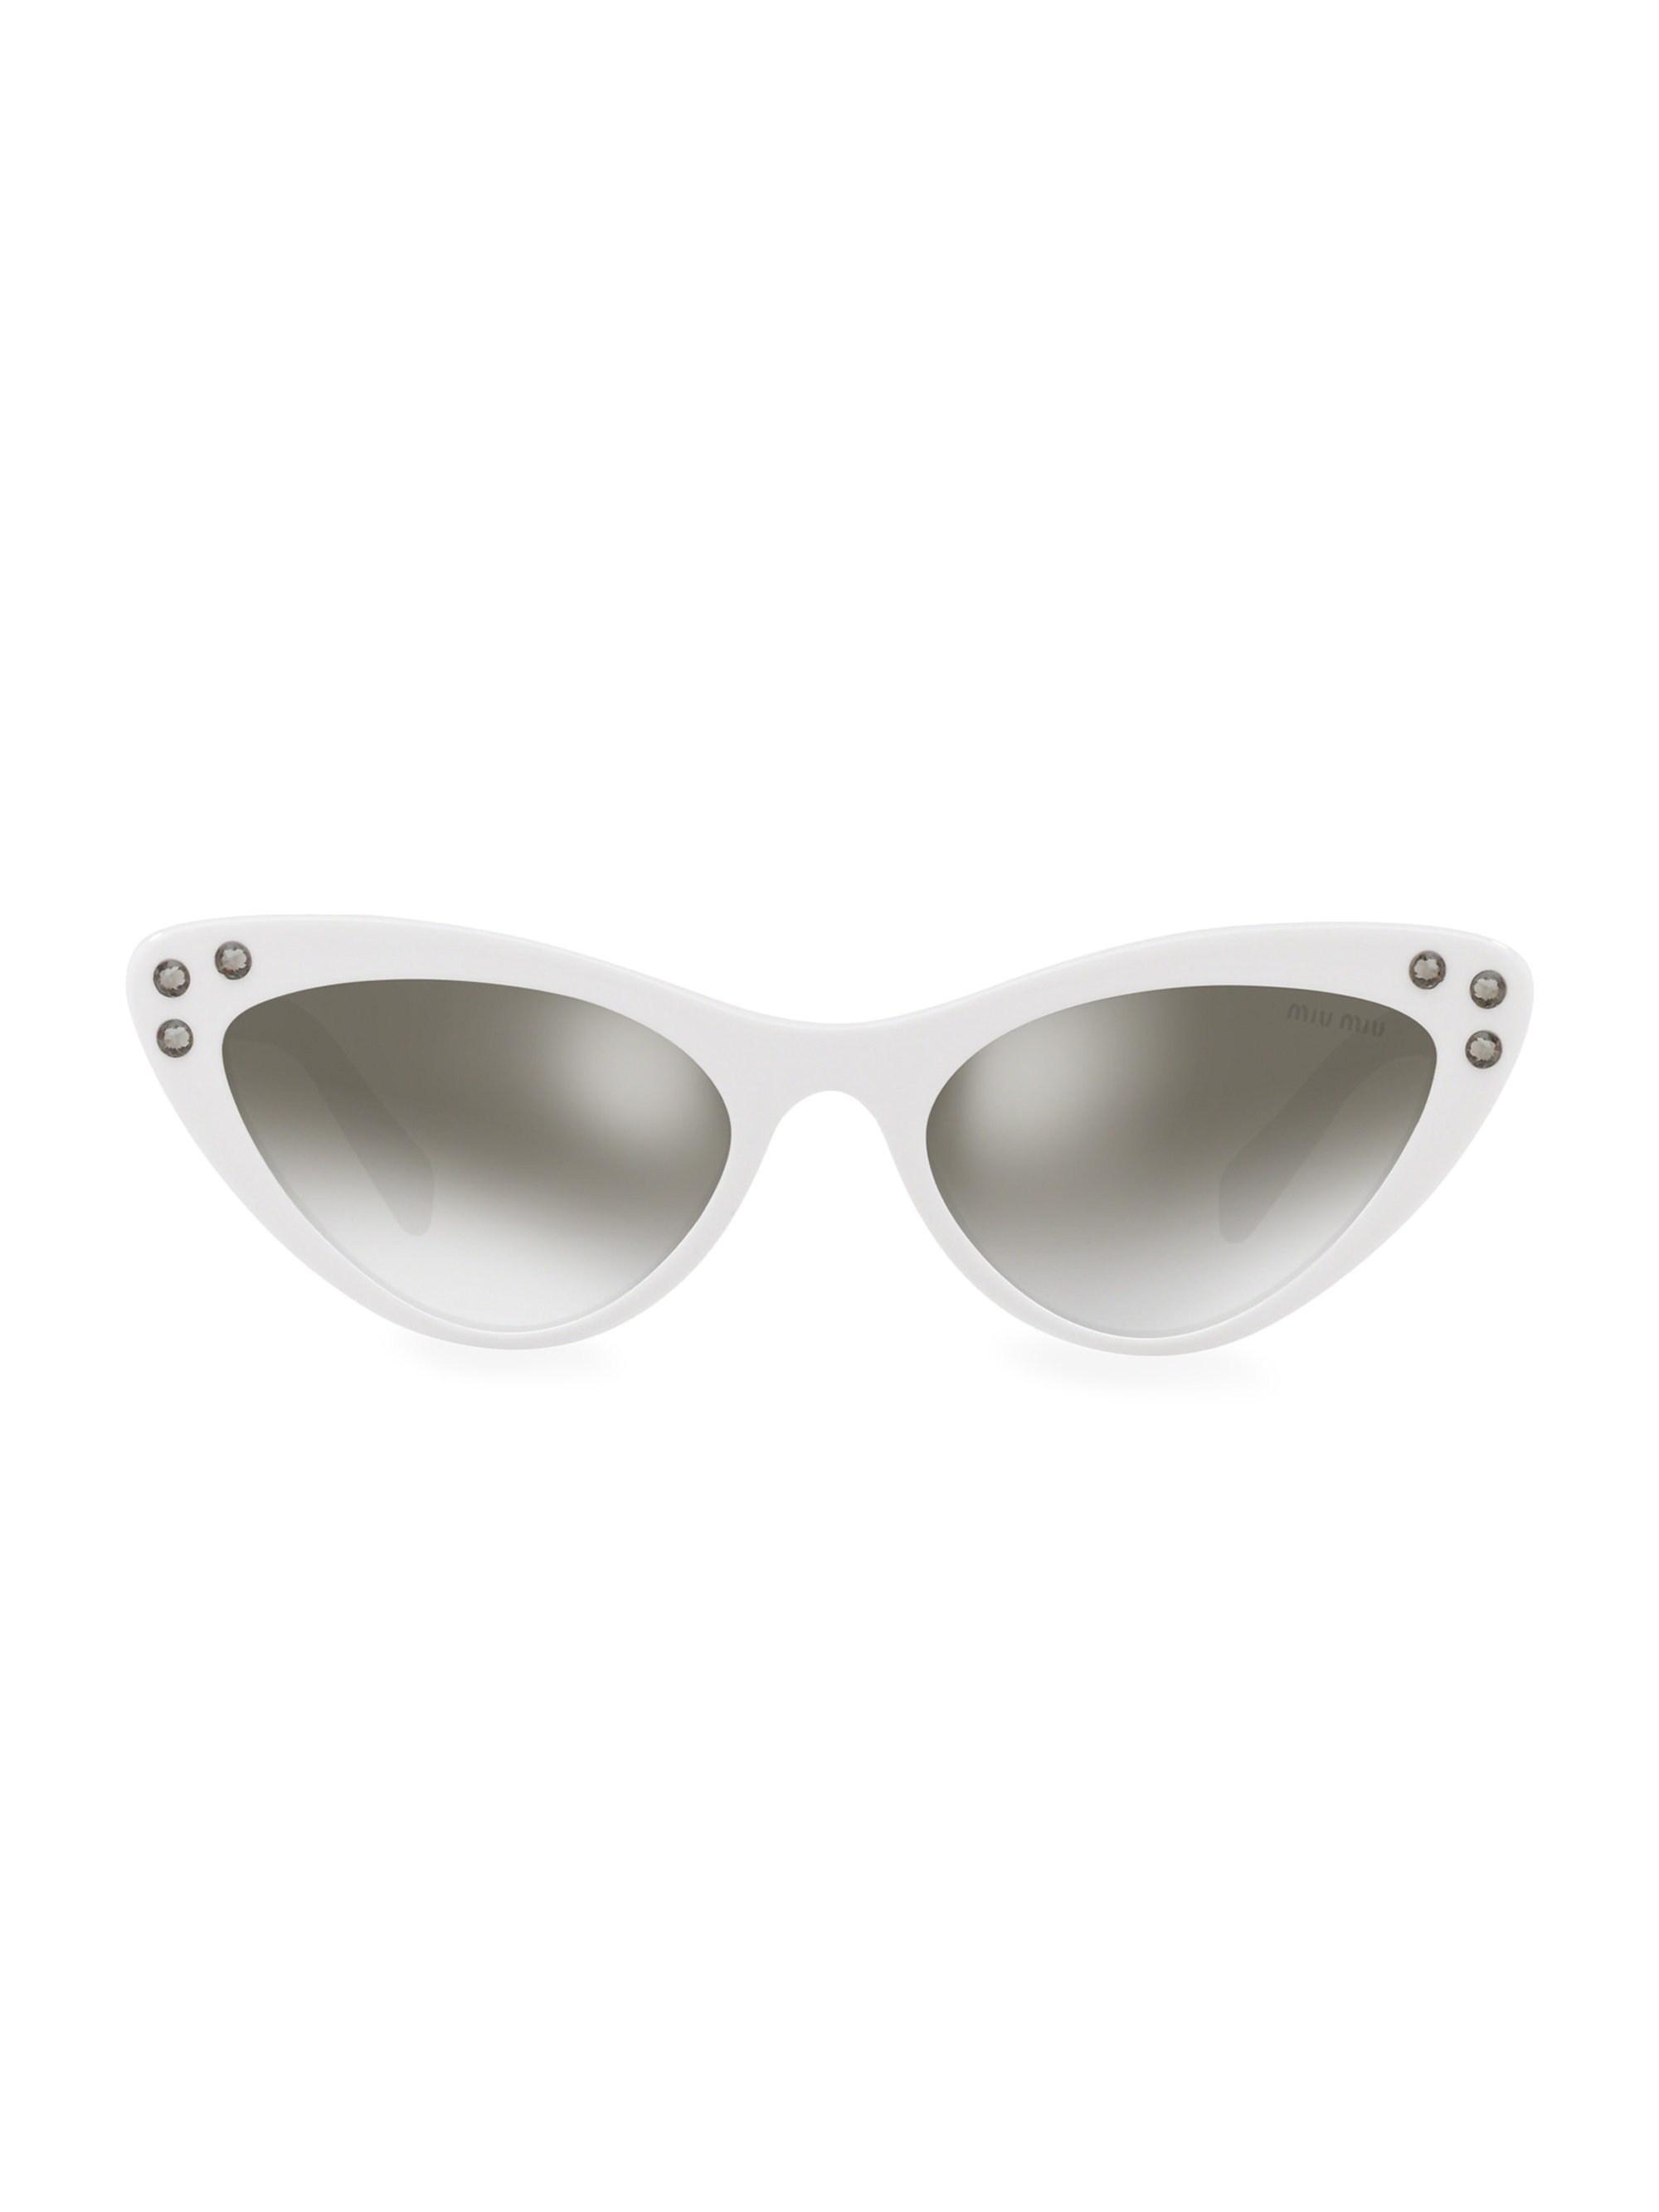 dd0682705708 Lyst - Miu Miu 55mm Crystal Studded Cat Eye Sunglasses - Save 50%